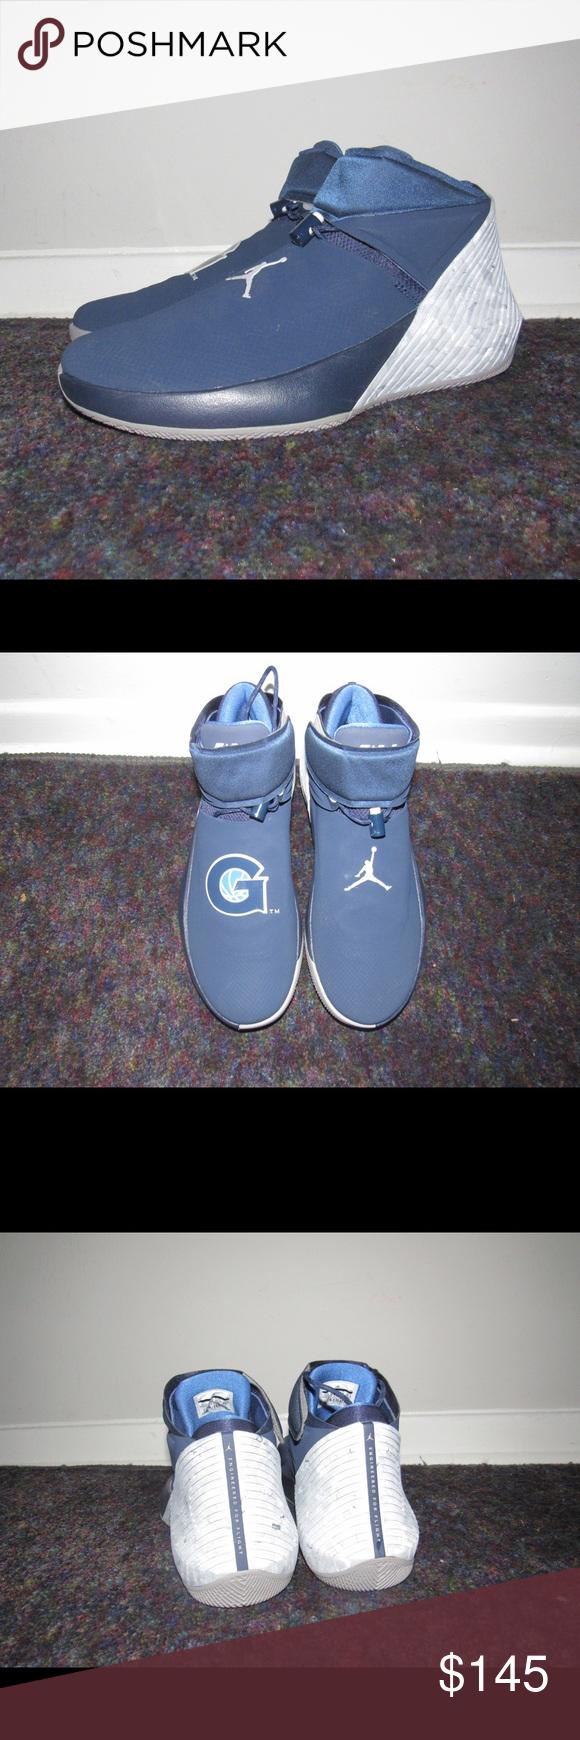 Jordan Why Not ZER0.1 Westbrook Georgetown Hoyas - Air Jordan Why Not ZER0.1  Westbrook AA2510-406 Size 11.5 Navy Georgetown Hoyas - Brand New without ... 2494401830